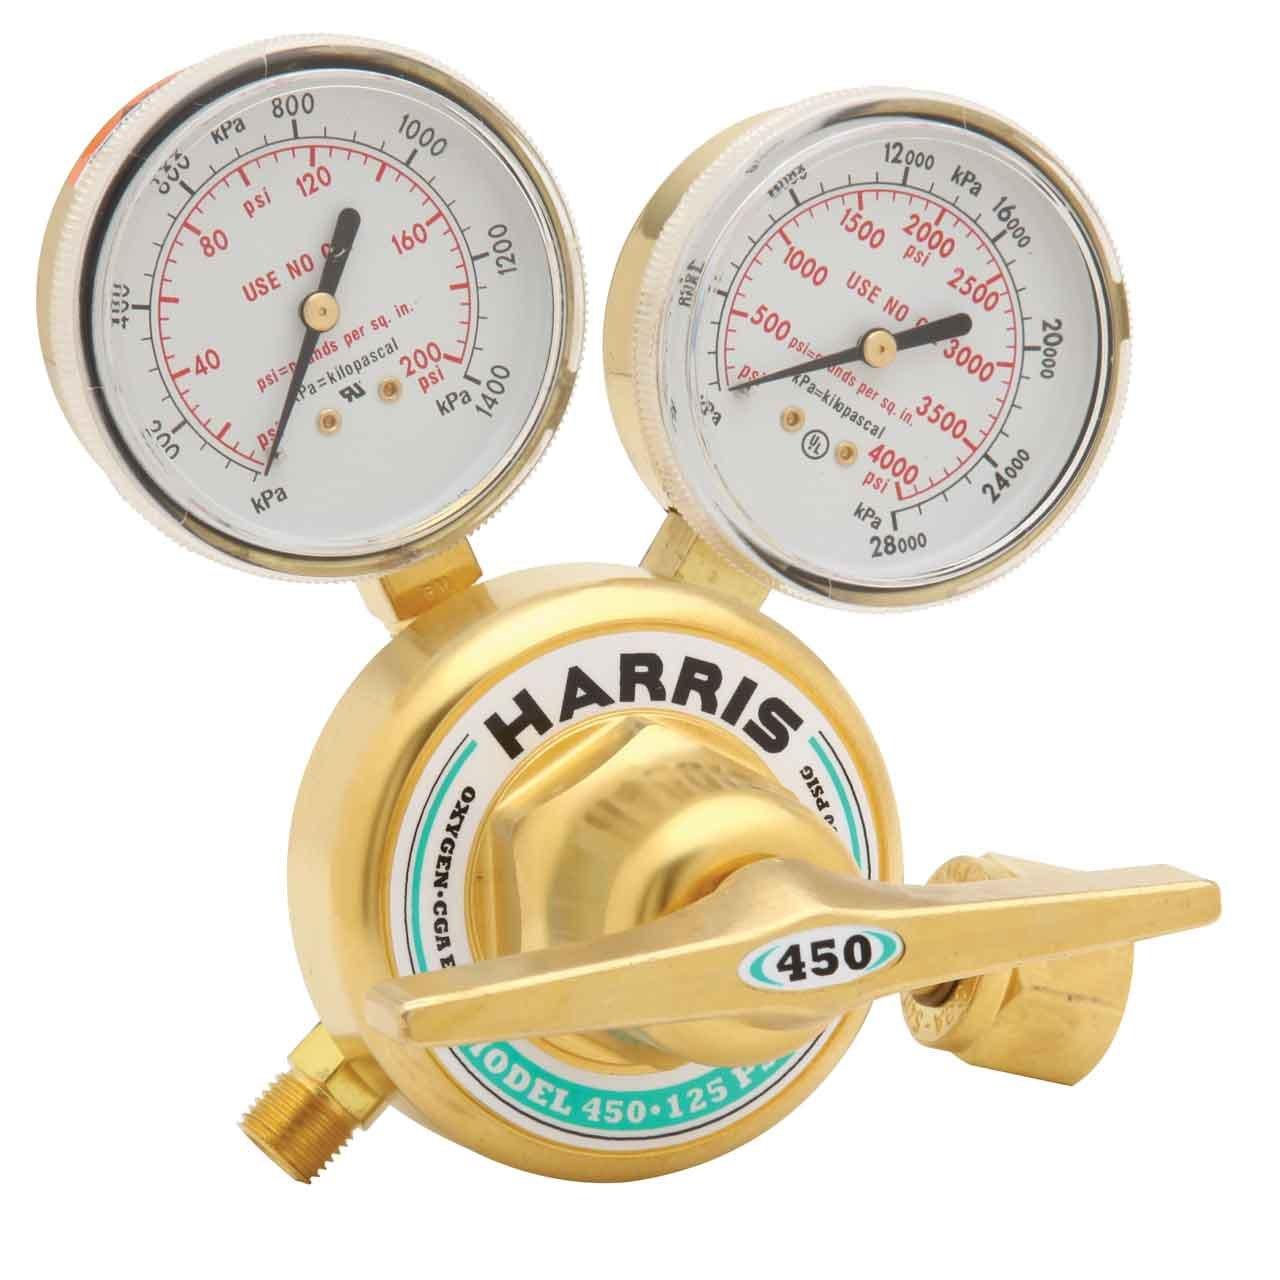 Gas Welding Equipment Harris 450 Xtra Heavy Duty Oxygen Regulator ...